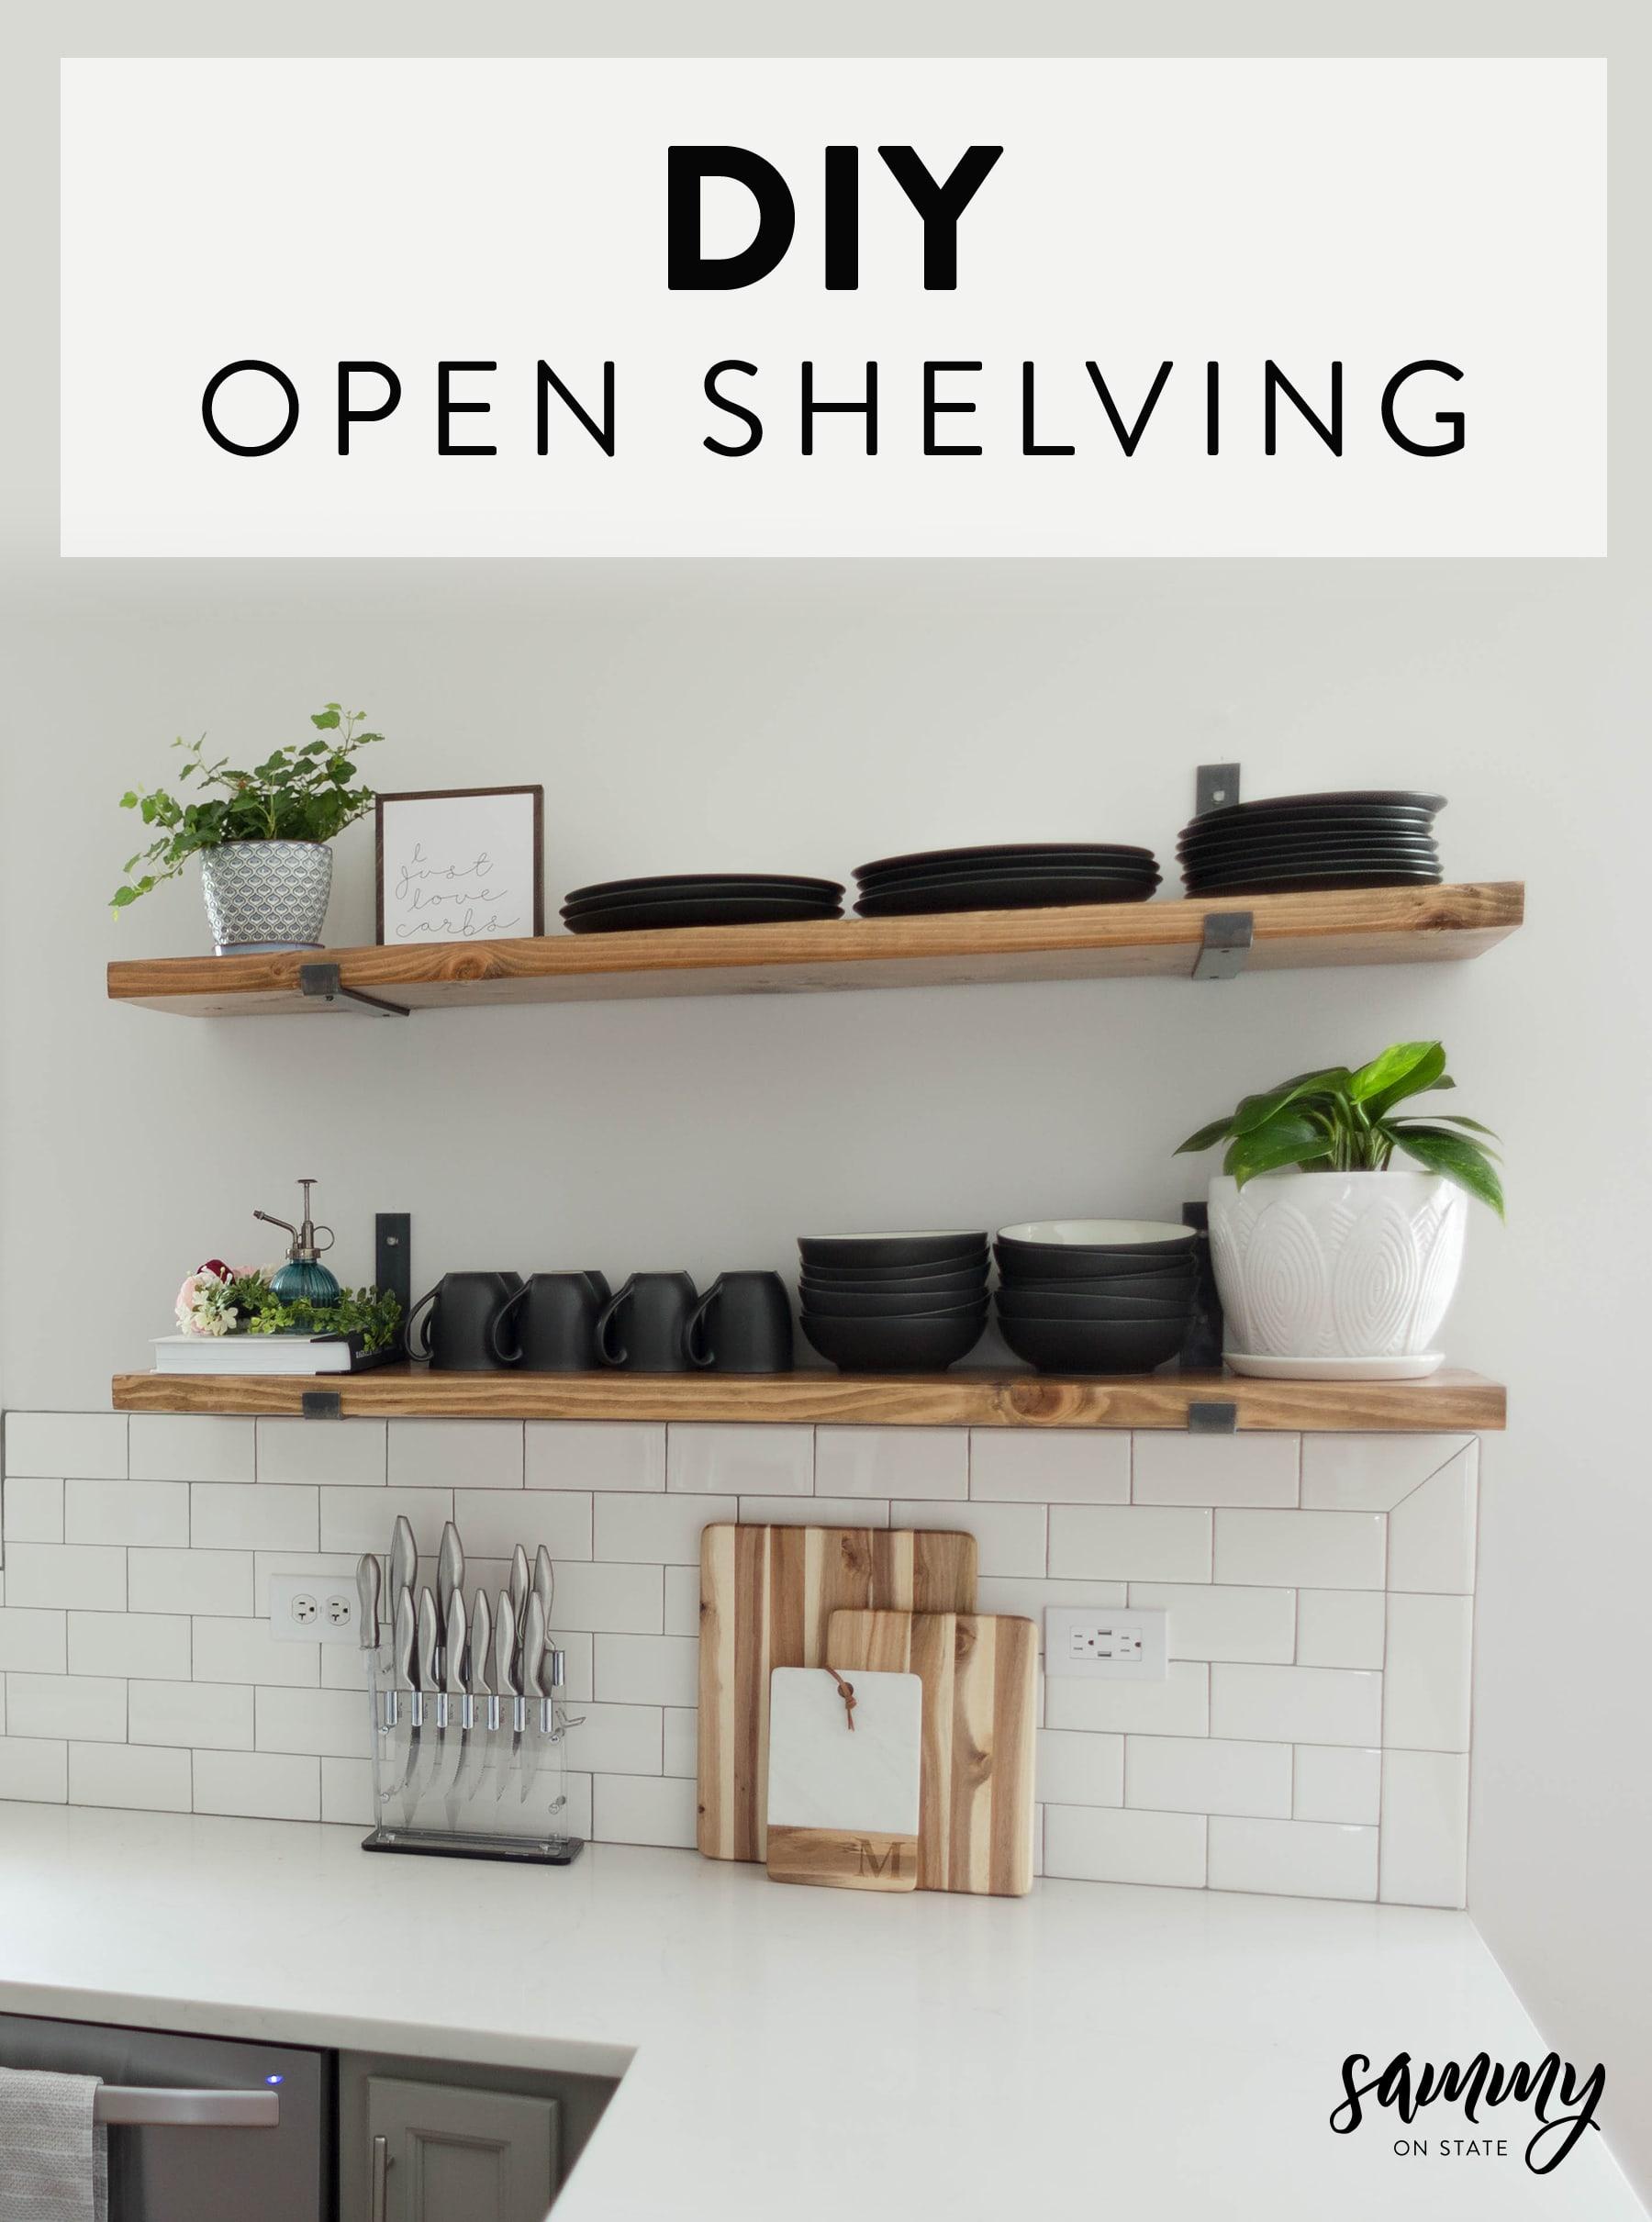 DIY Open Shelving Sammy On State Pinterest